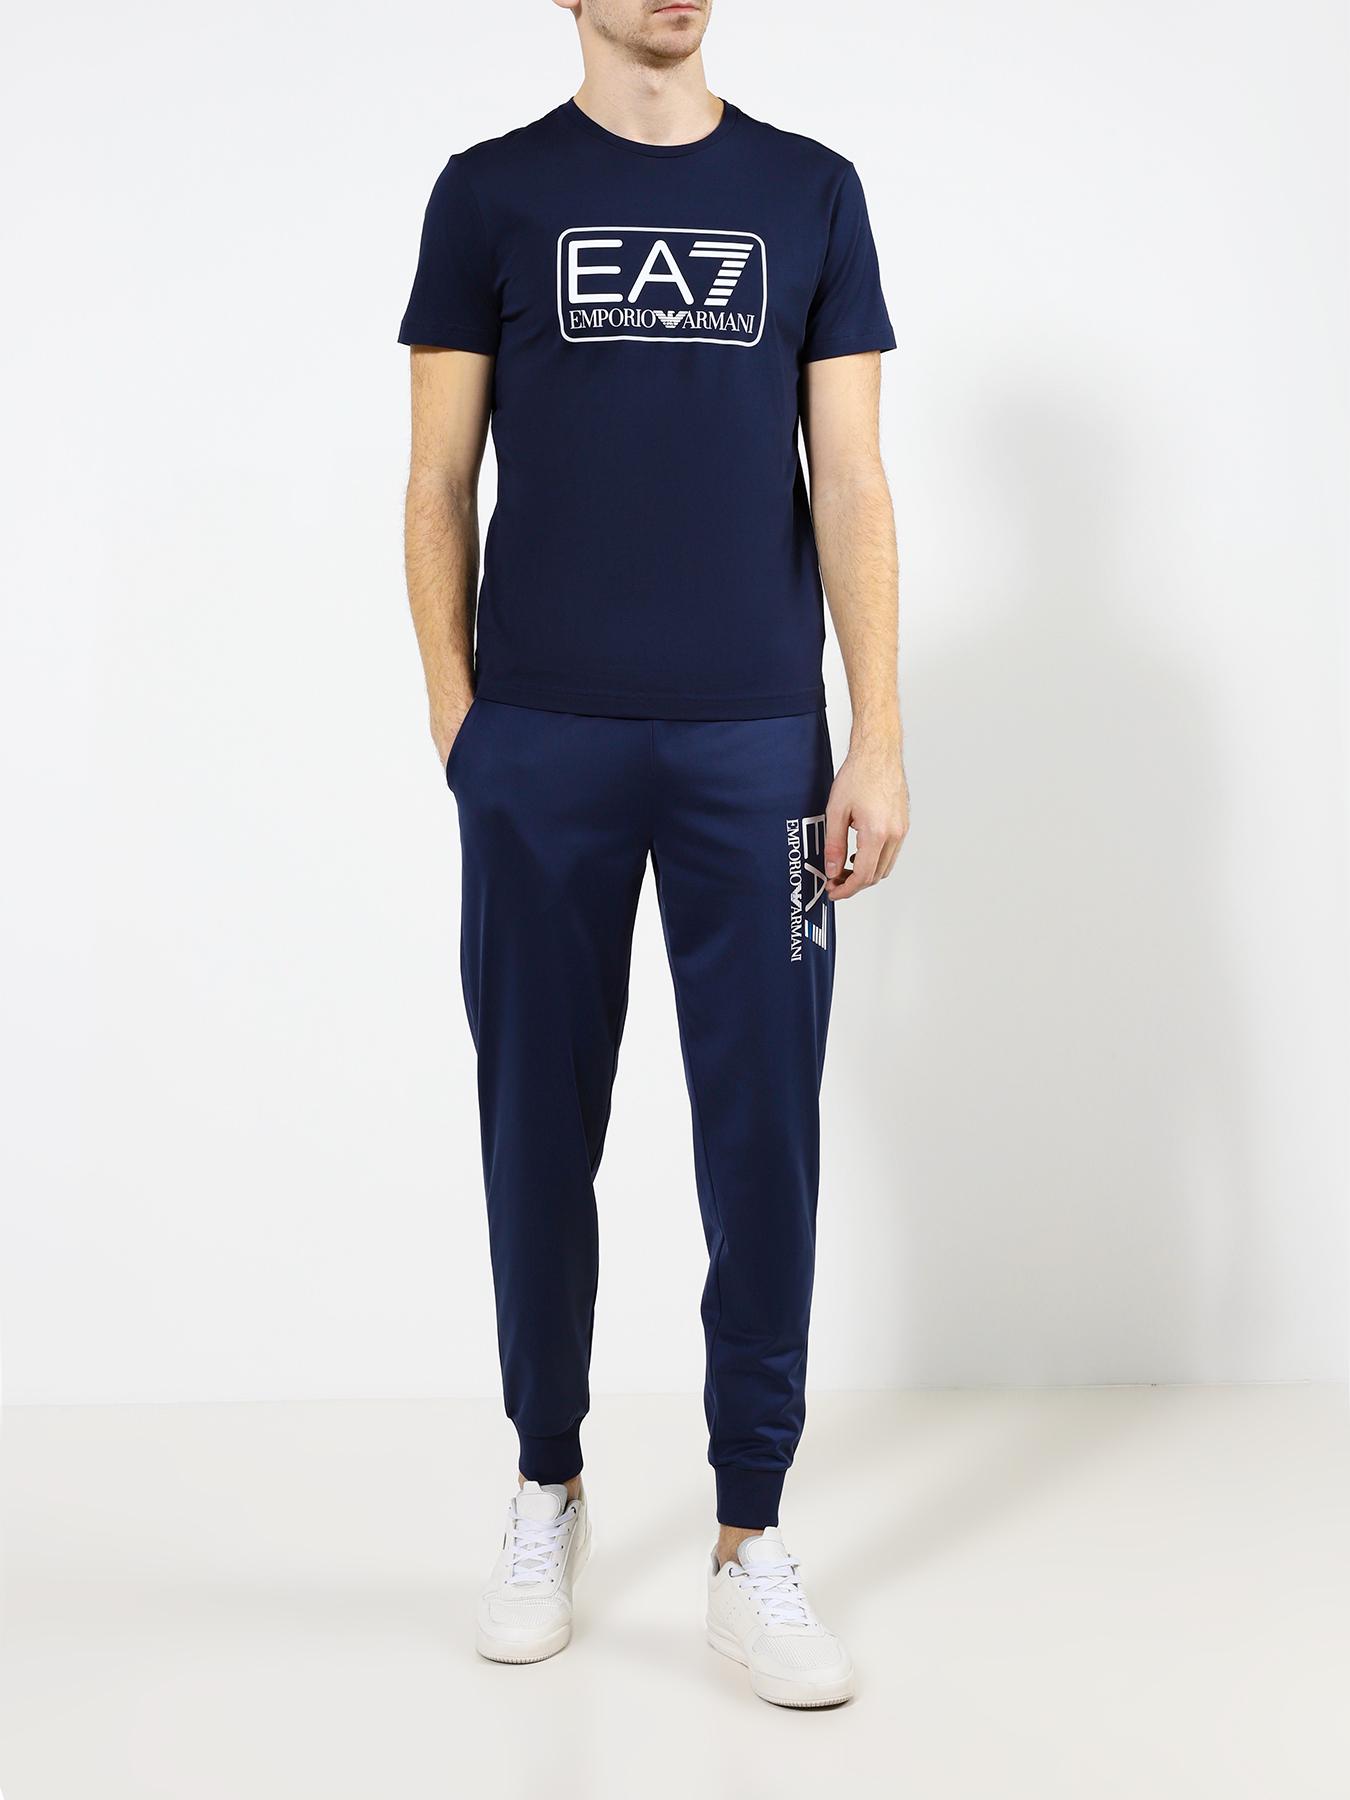 Фуфайка (футболка) EA7 Emporio Armani Футболка кроссовки ea7 emporio armani кеды